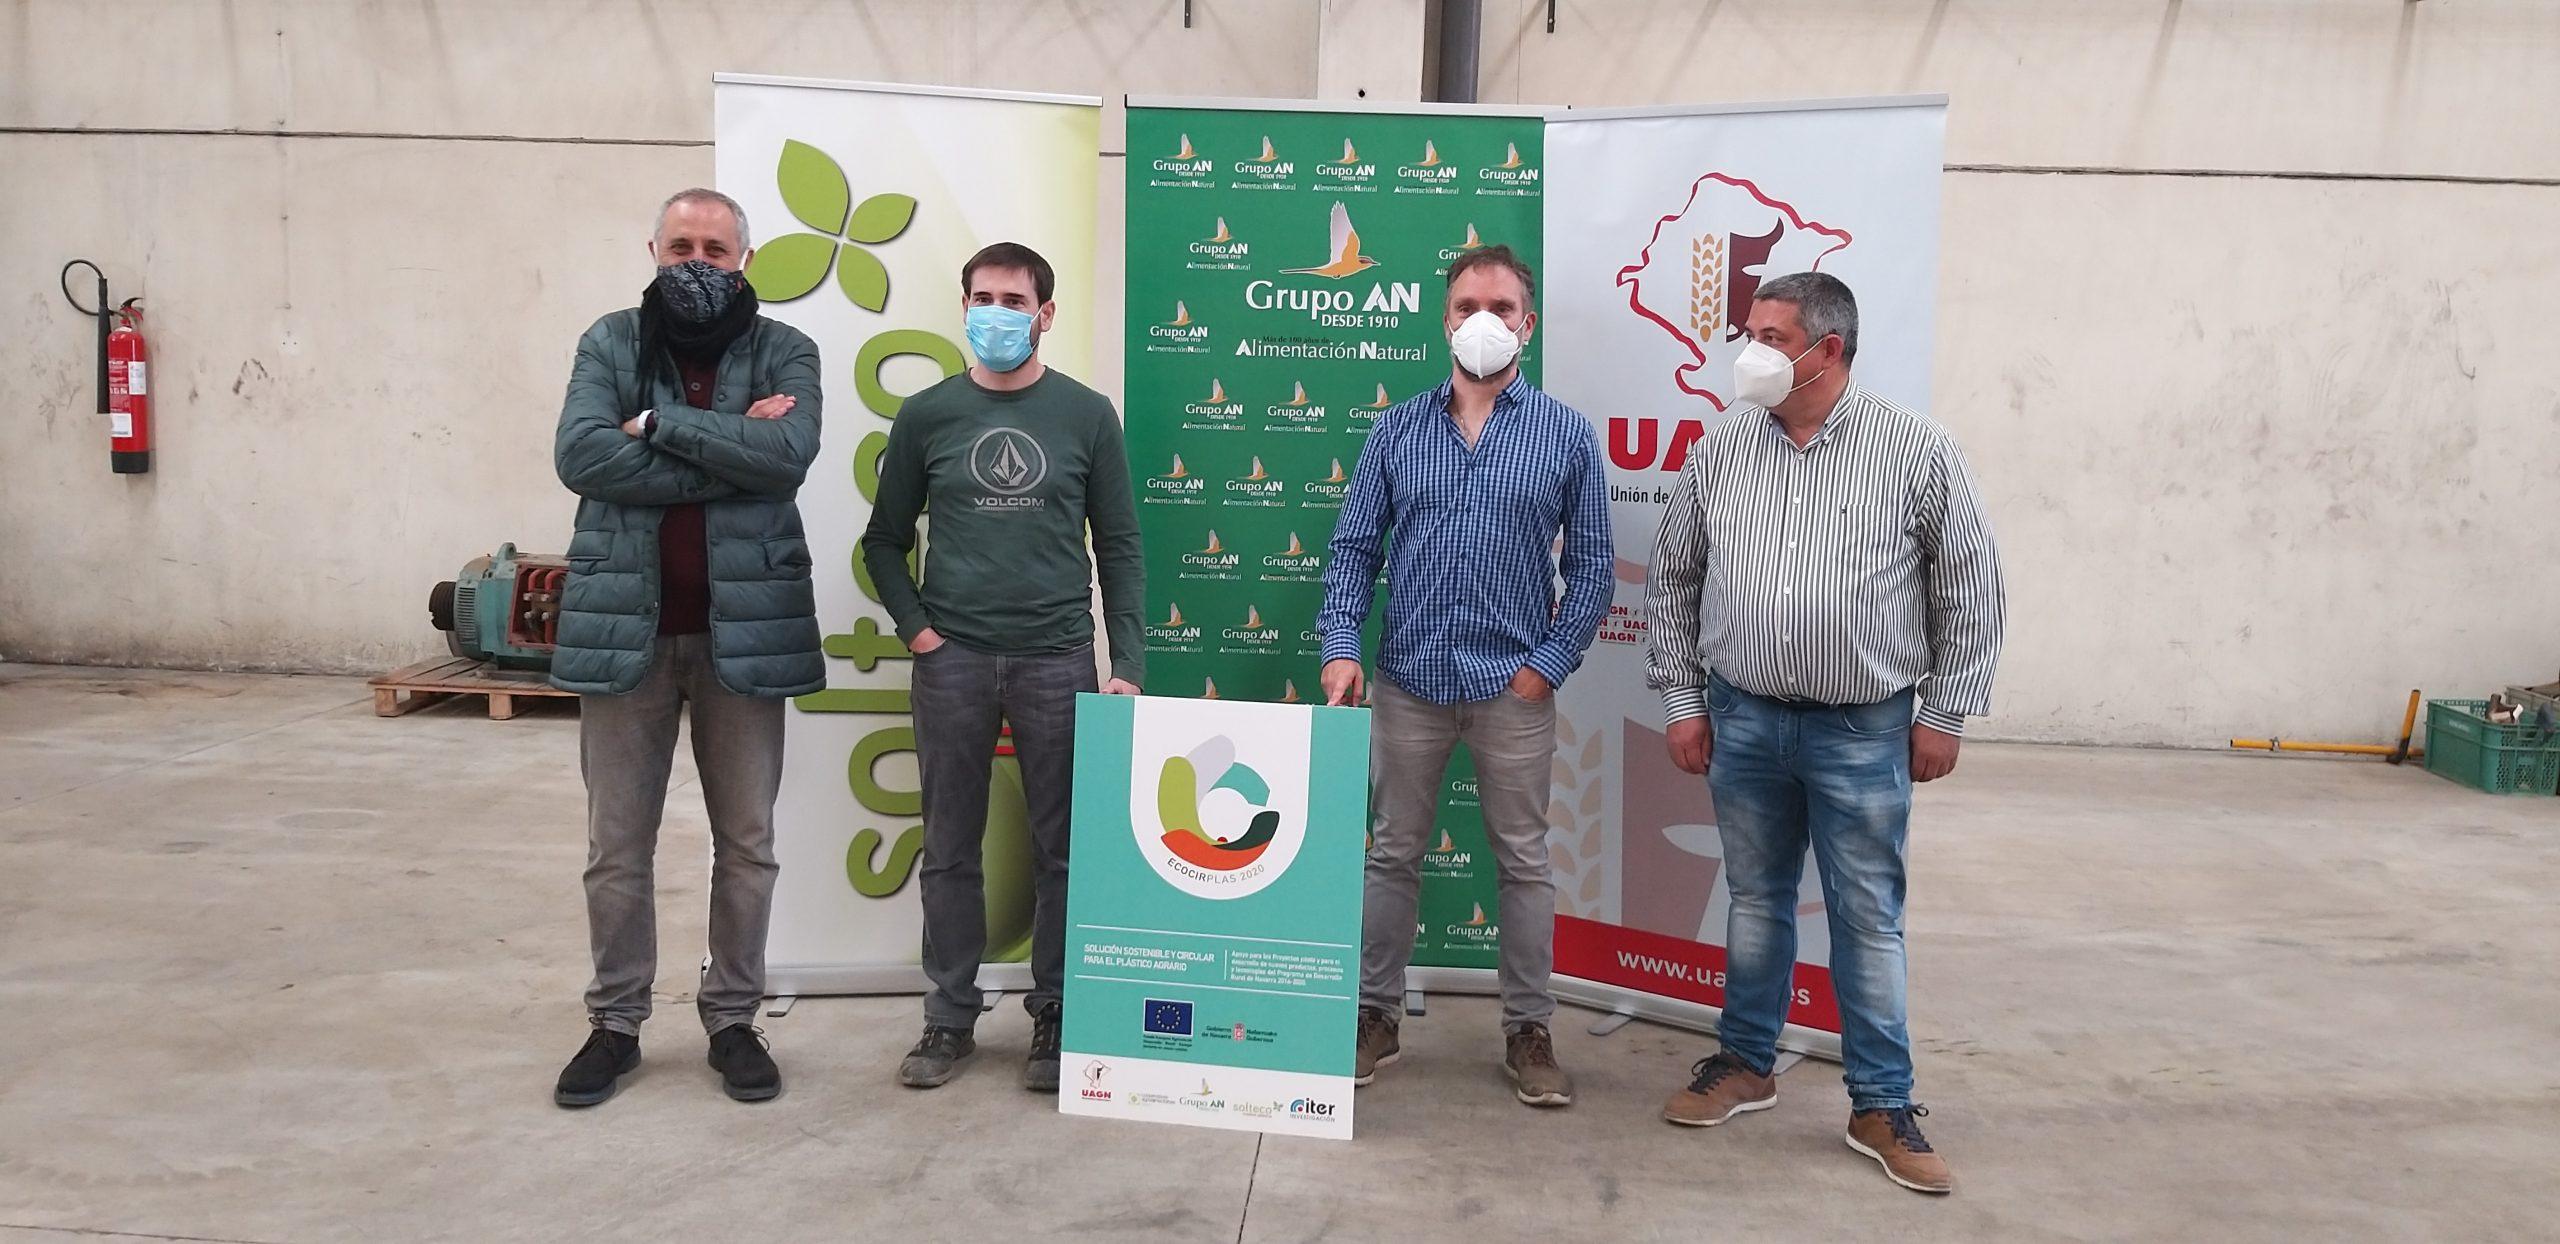 De izda. a dcha.:Arturo Ferrer (Iter Investigación), Sergio Menendez (Grupo AN), Iñaki Mendioroz (UAGN) y Vicente Sáinz (Solteco)